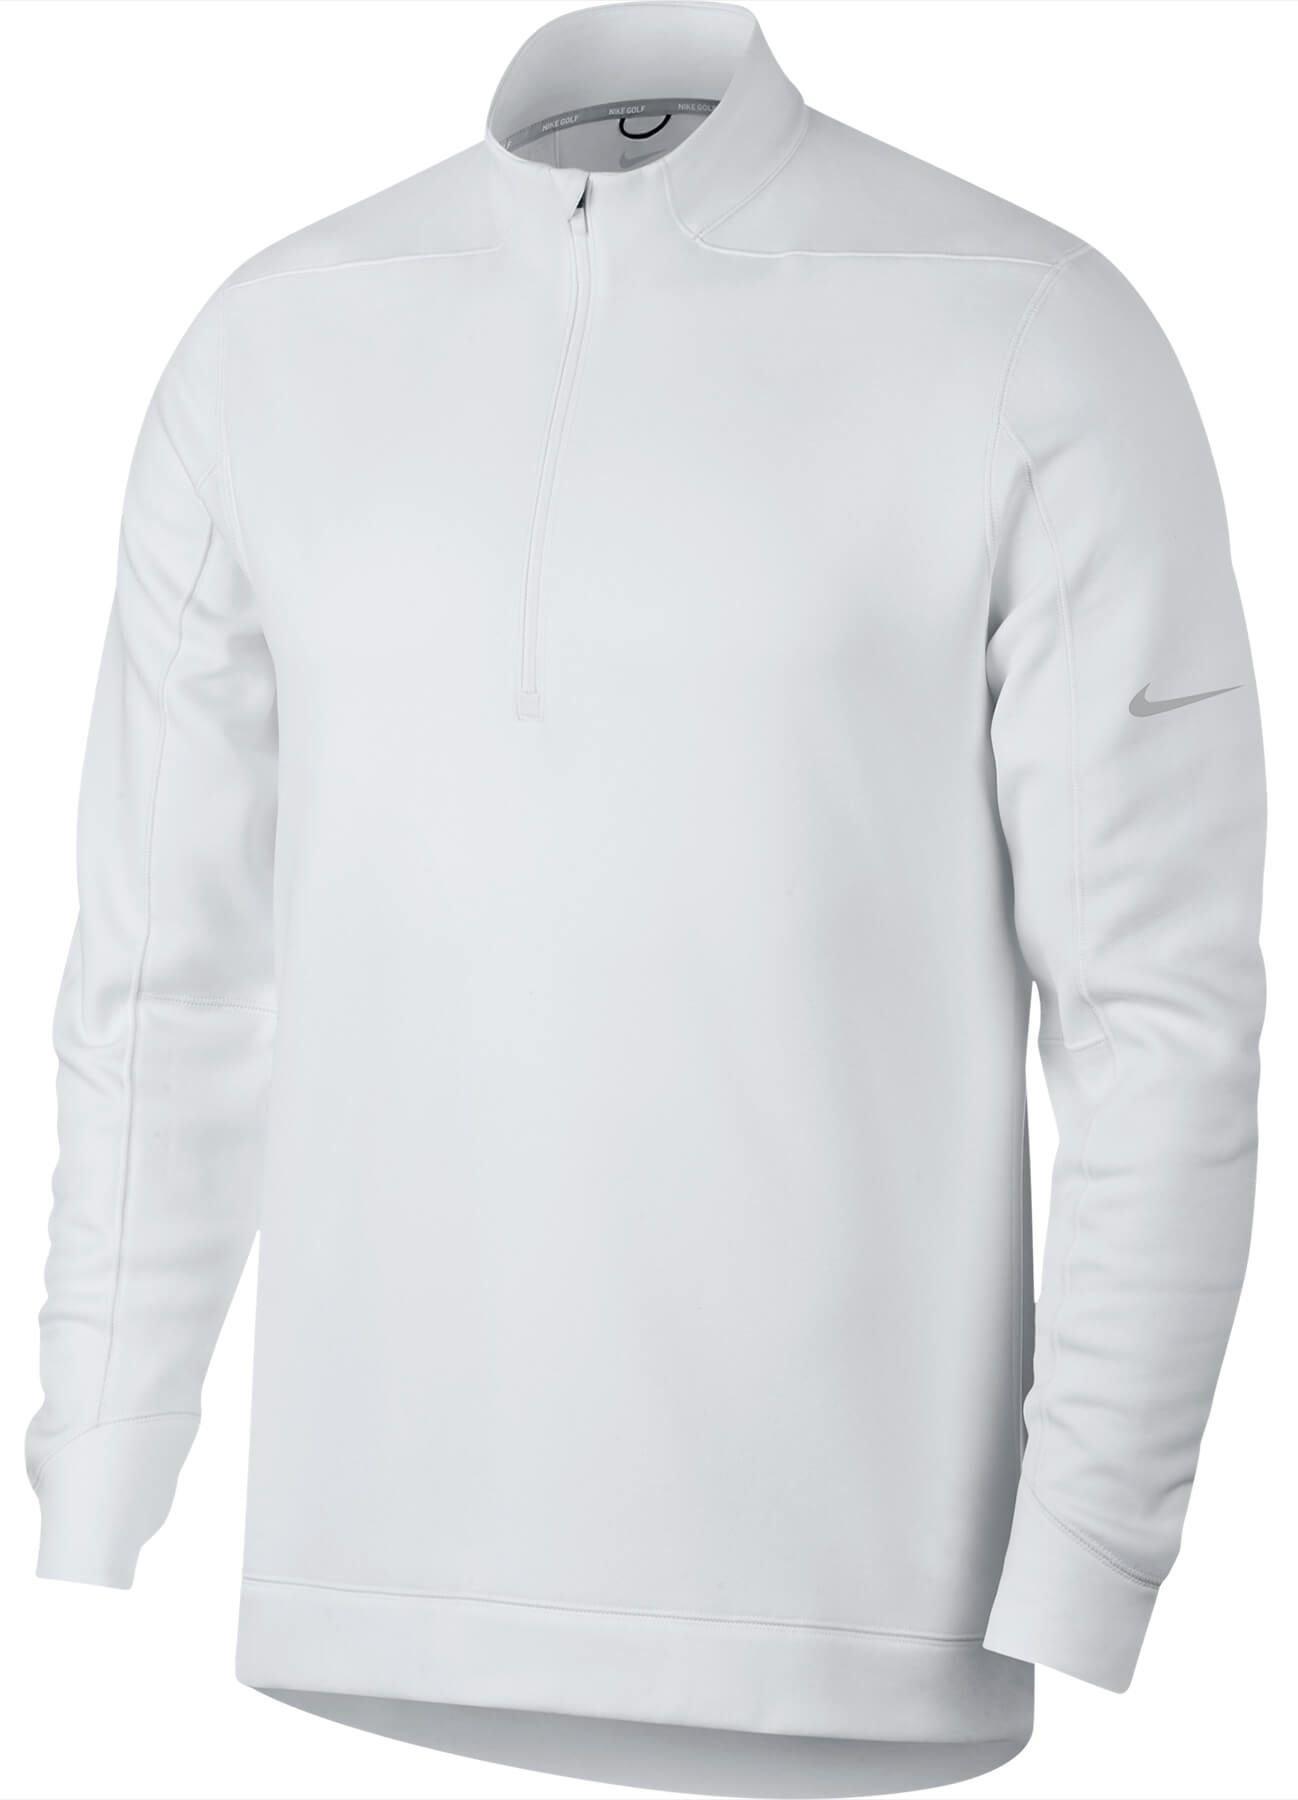 historia Mono Acción de gracias  Nike Therma Fit Repel Long Sleeve Golf Pullover ON SALE - Carl's Golfland